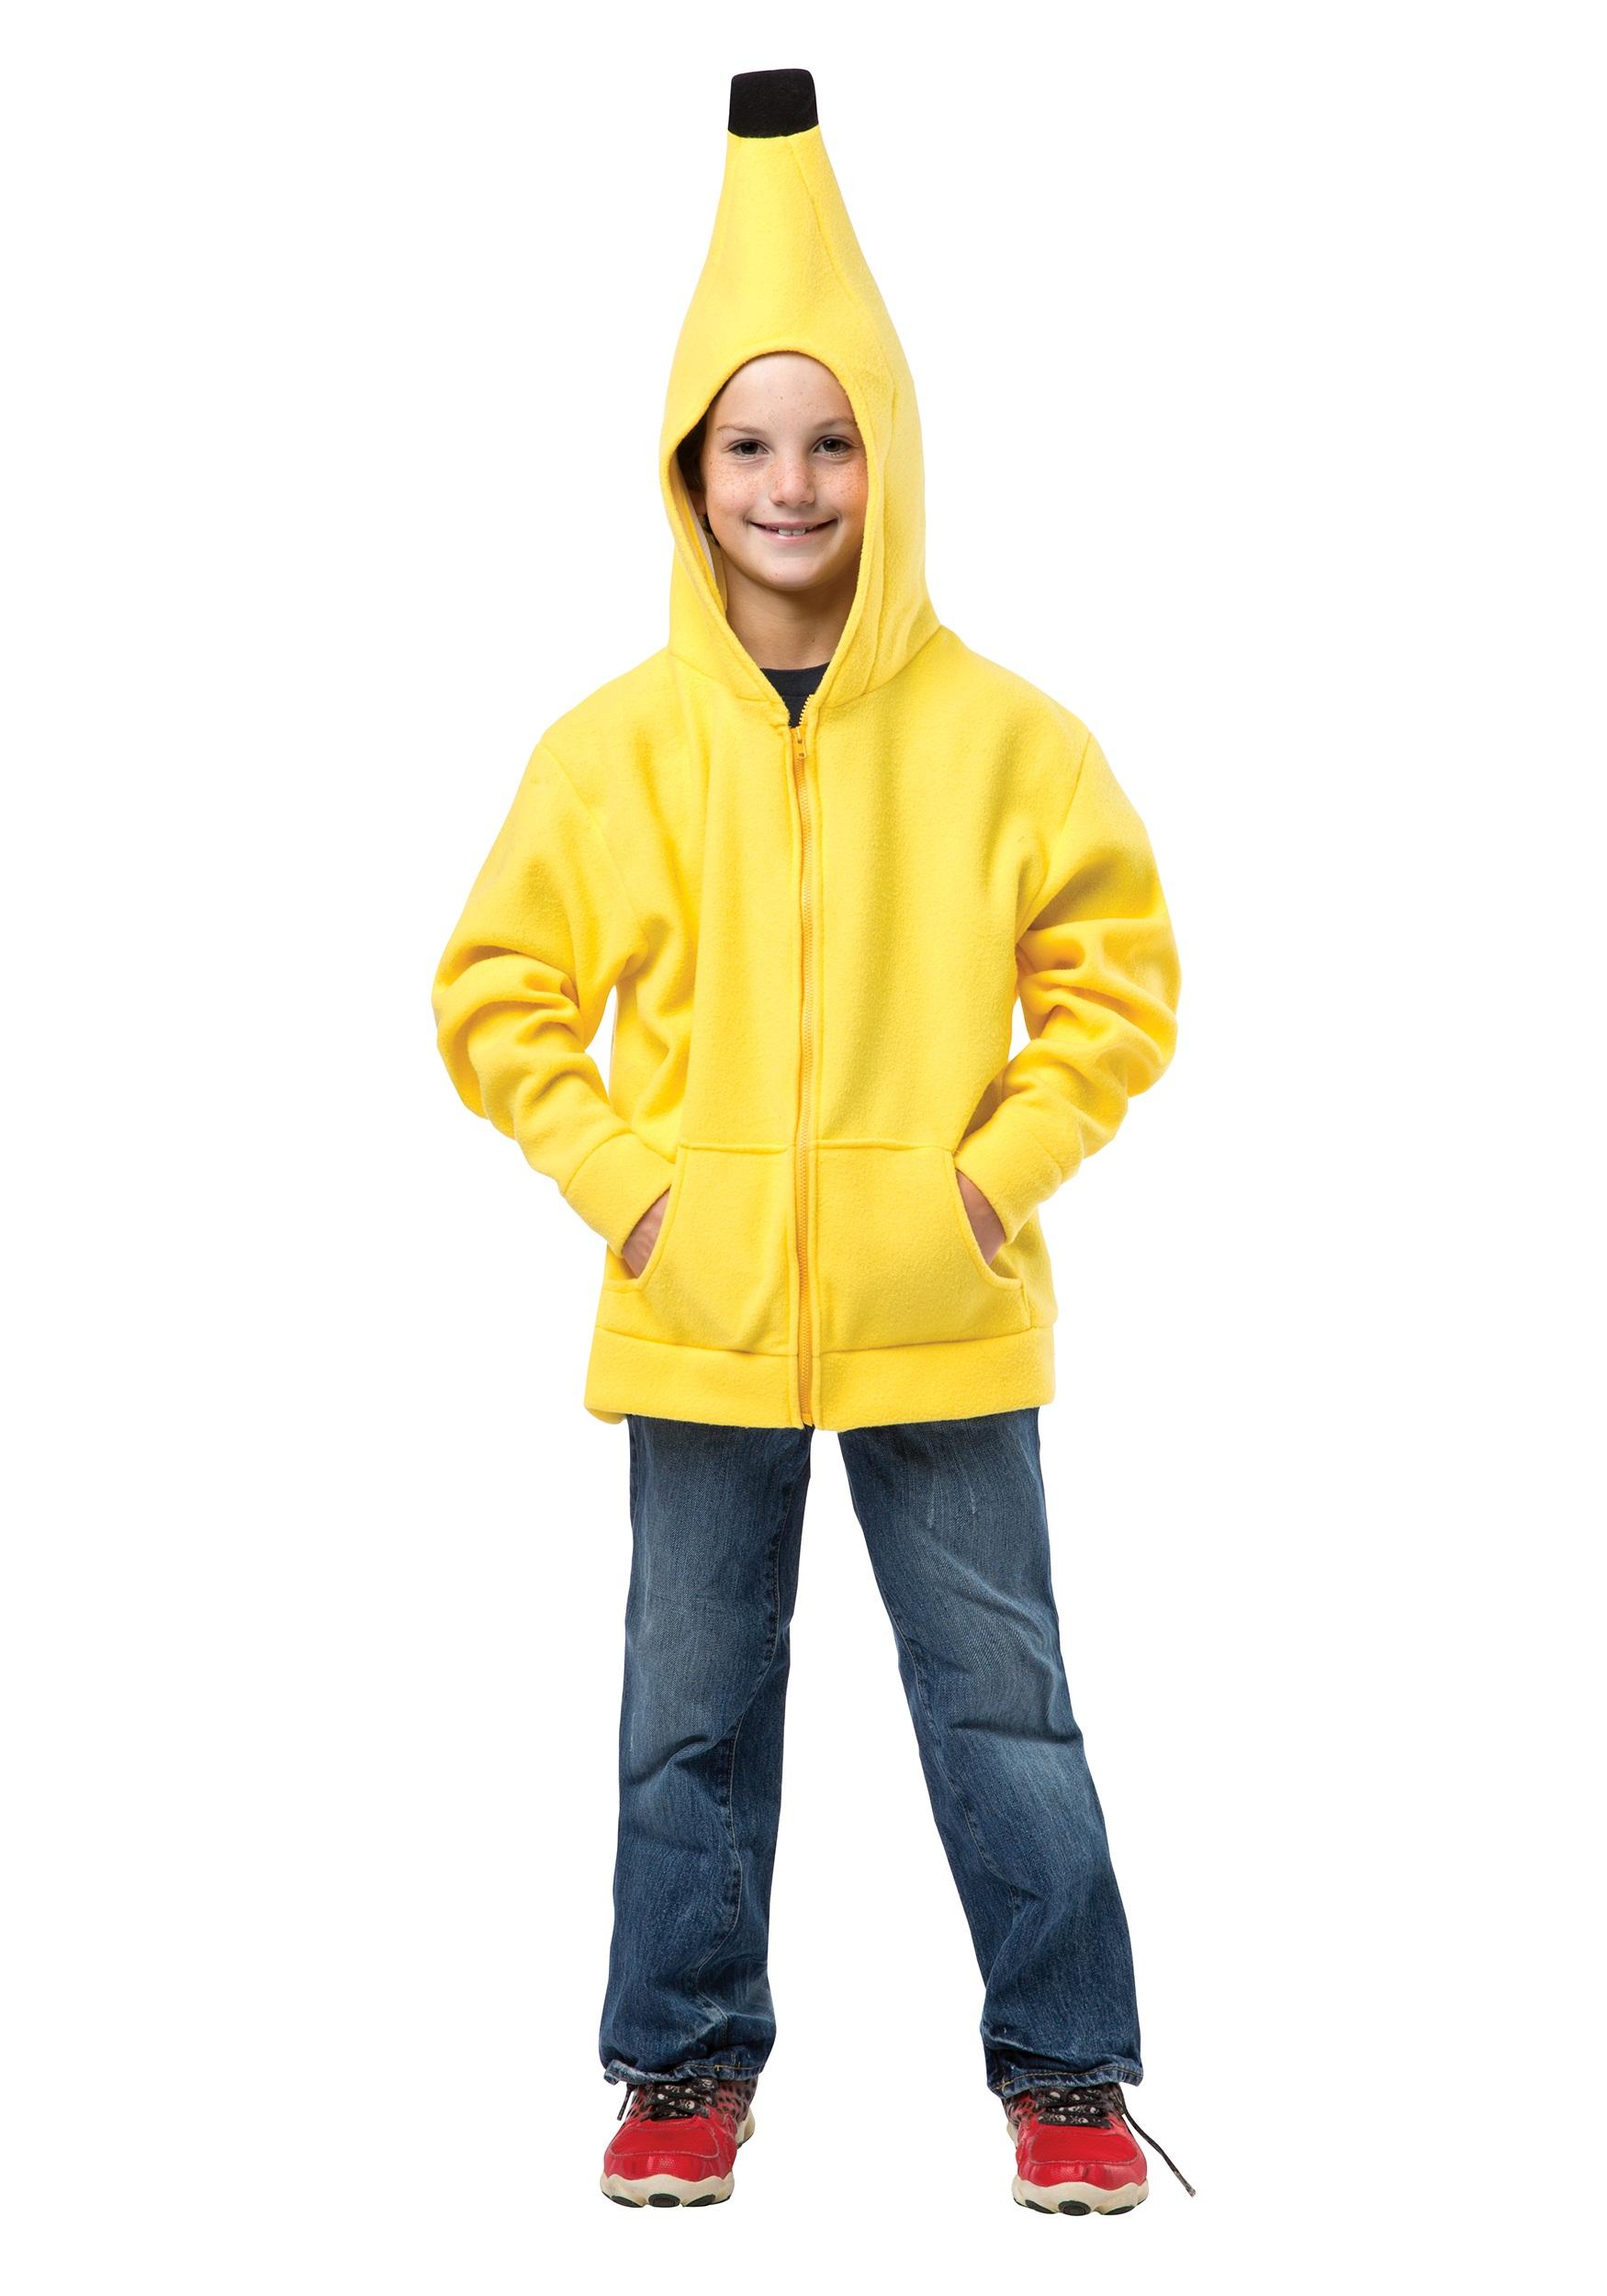 Child Banana Hooded Sweatshirt  sc 1 st  Halloween Costumes & Child Banana Hooded Sweatshirt - Halloween Costumes